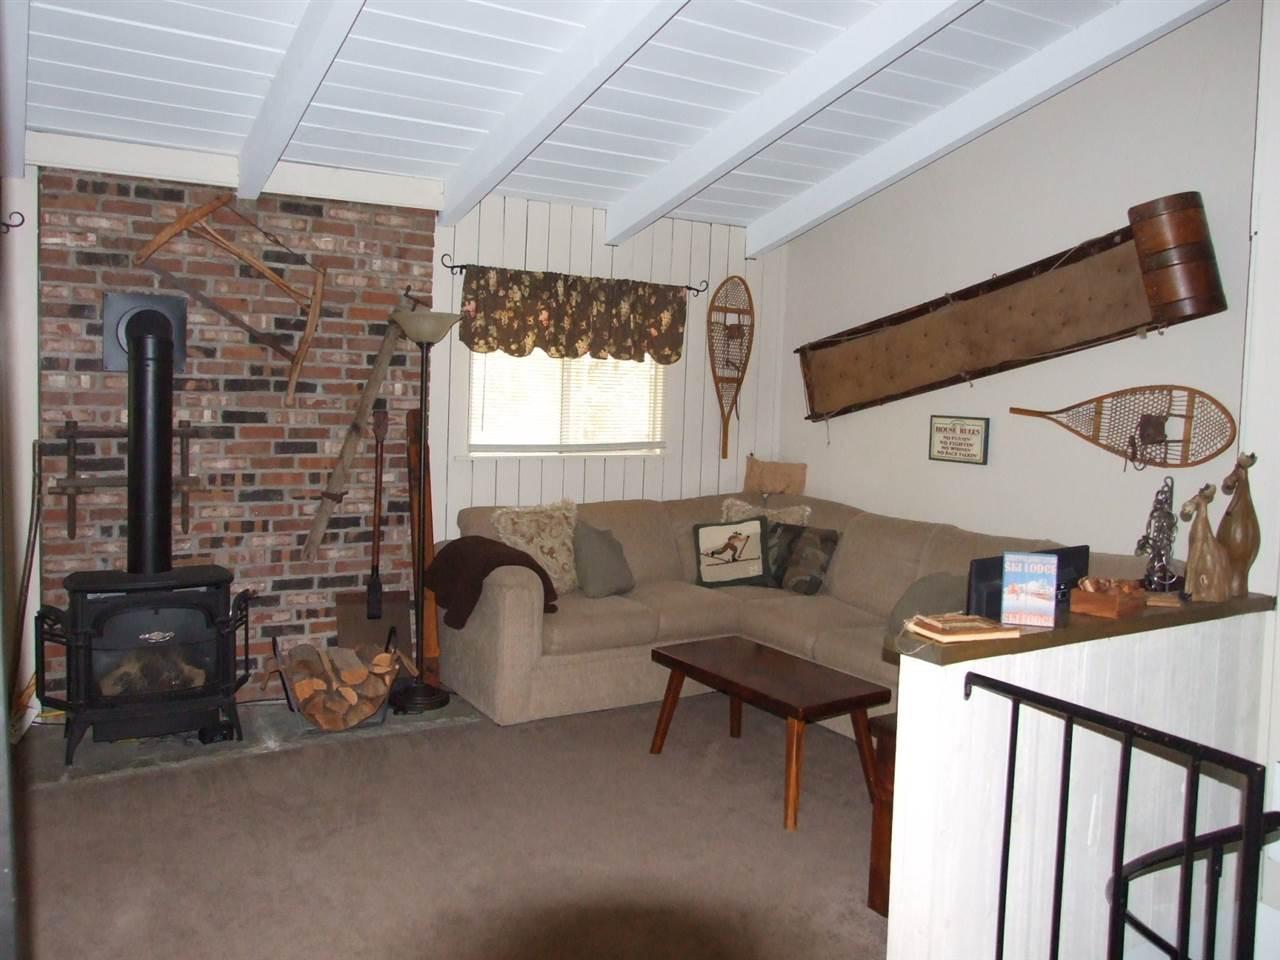 Spacious Living Room with propane stove. 12016406